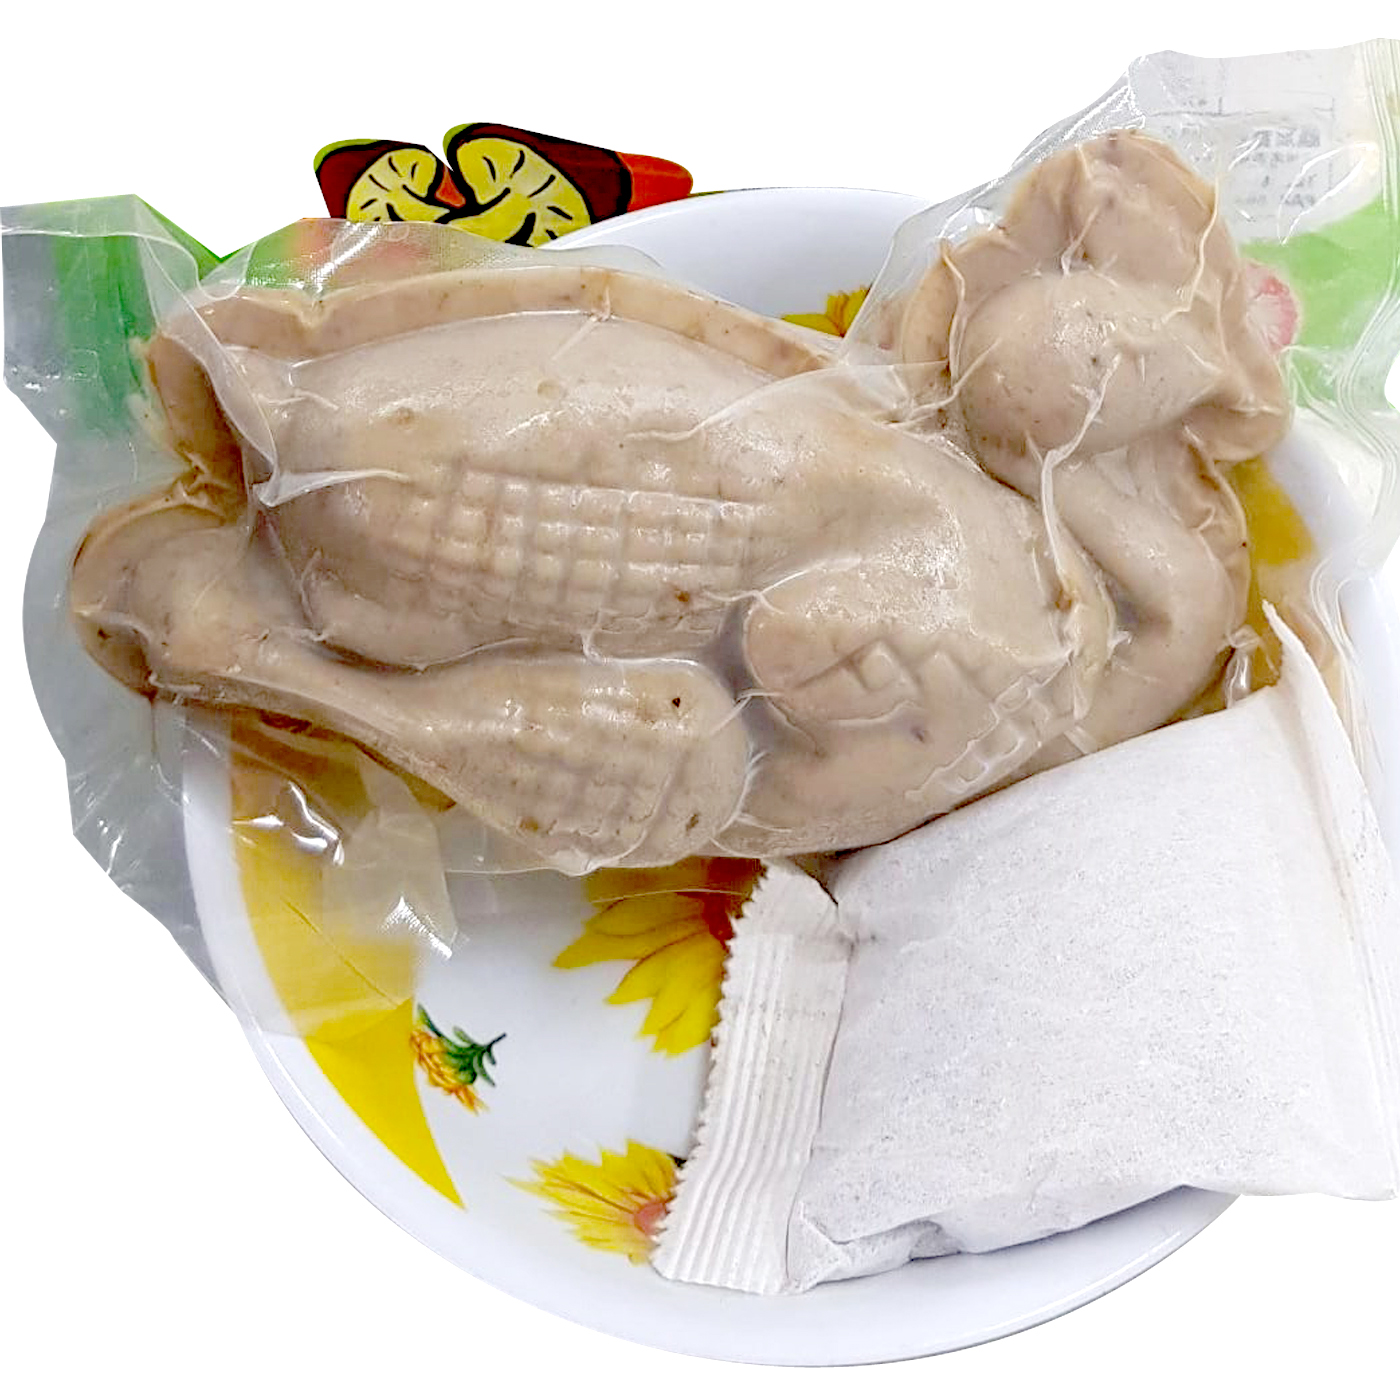 Image 4 Herbs Chicken 笙惠 - 香菇四物鸡 500grams